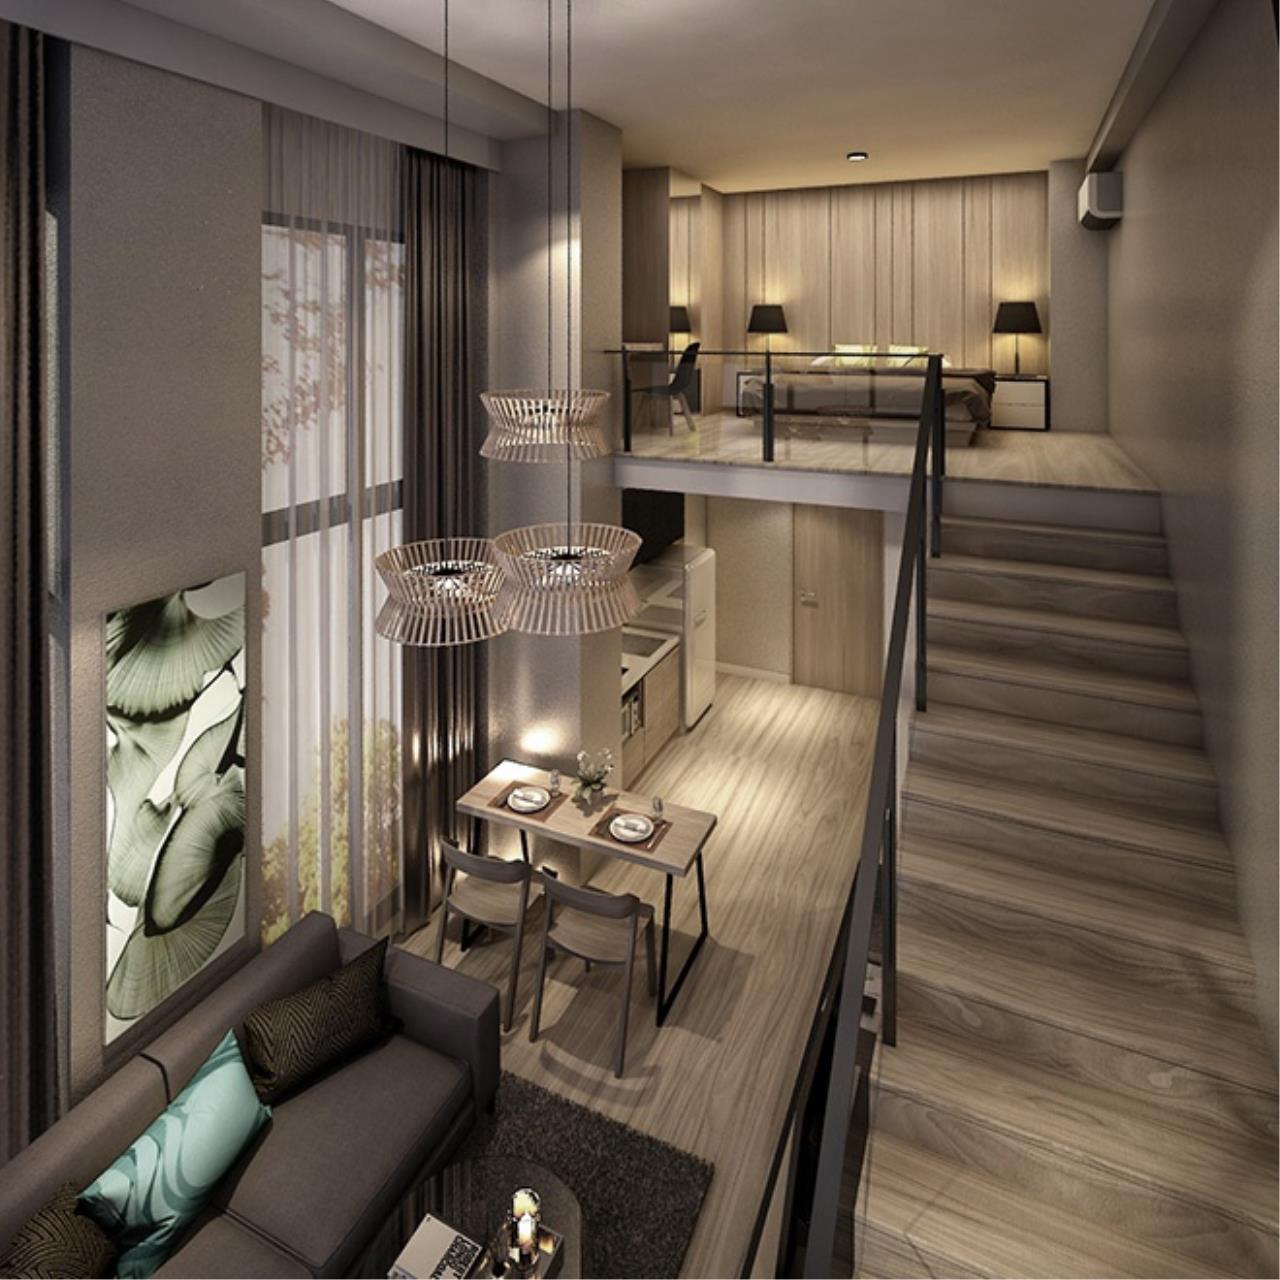 Century21 Skylux Agency's Blossom Condo @ Sathorn-Charoenrat / Condo For Sale / 1 Bedroom / 46.91 SQM / BTS Surasak / Bangkok 1